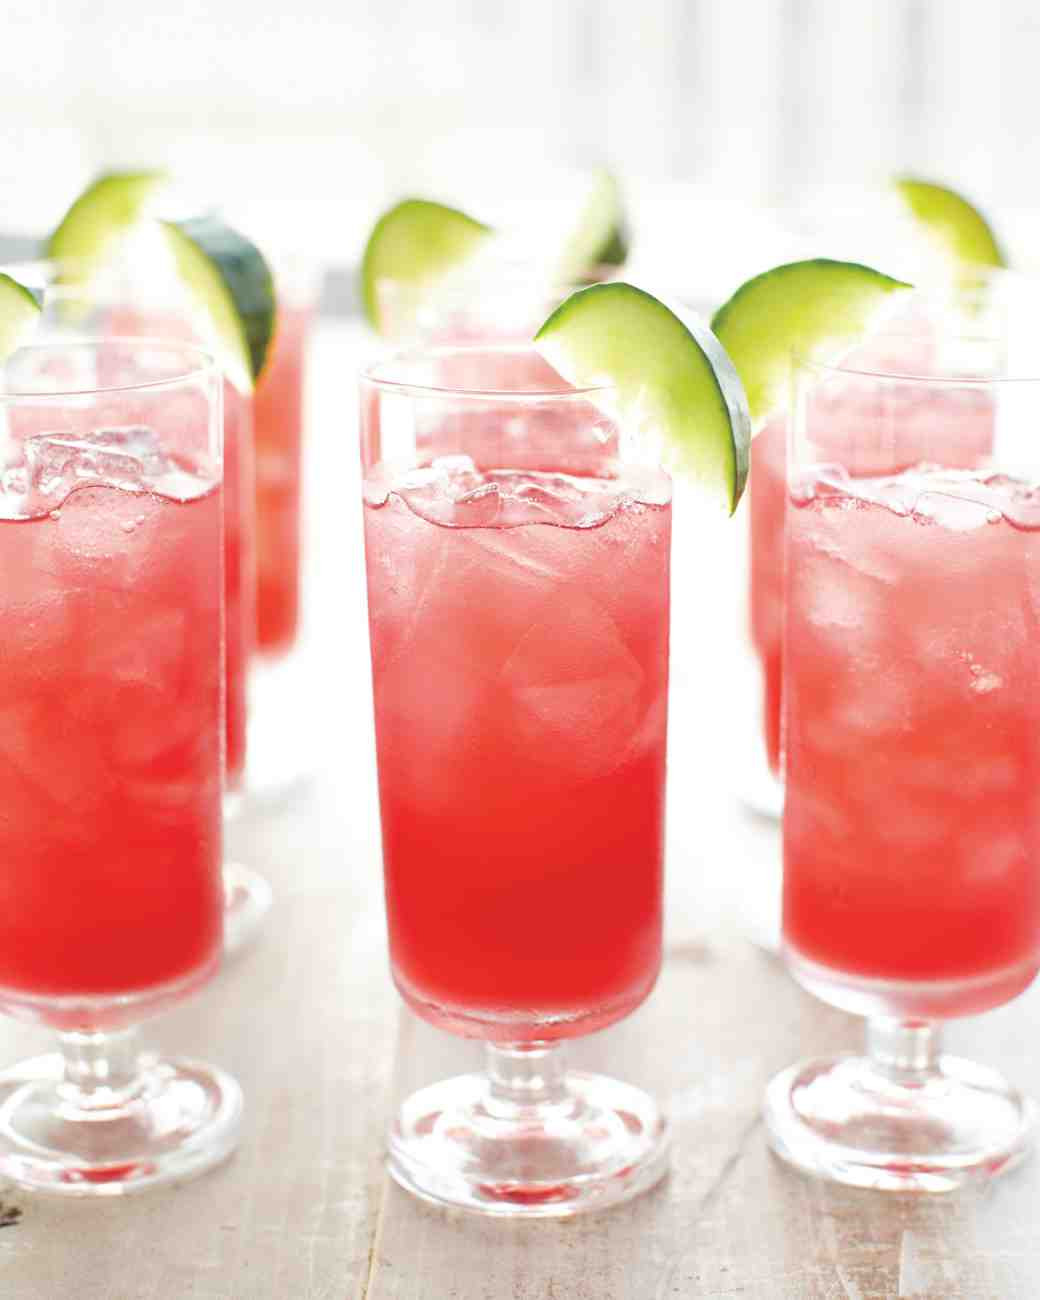 Vodka Drinks Mix  Vodka Cocktail Recipes for all Seasons